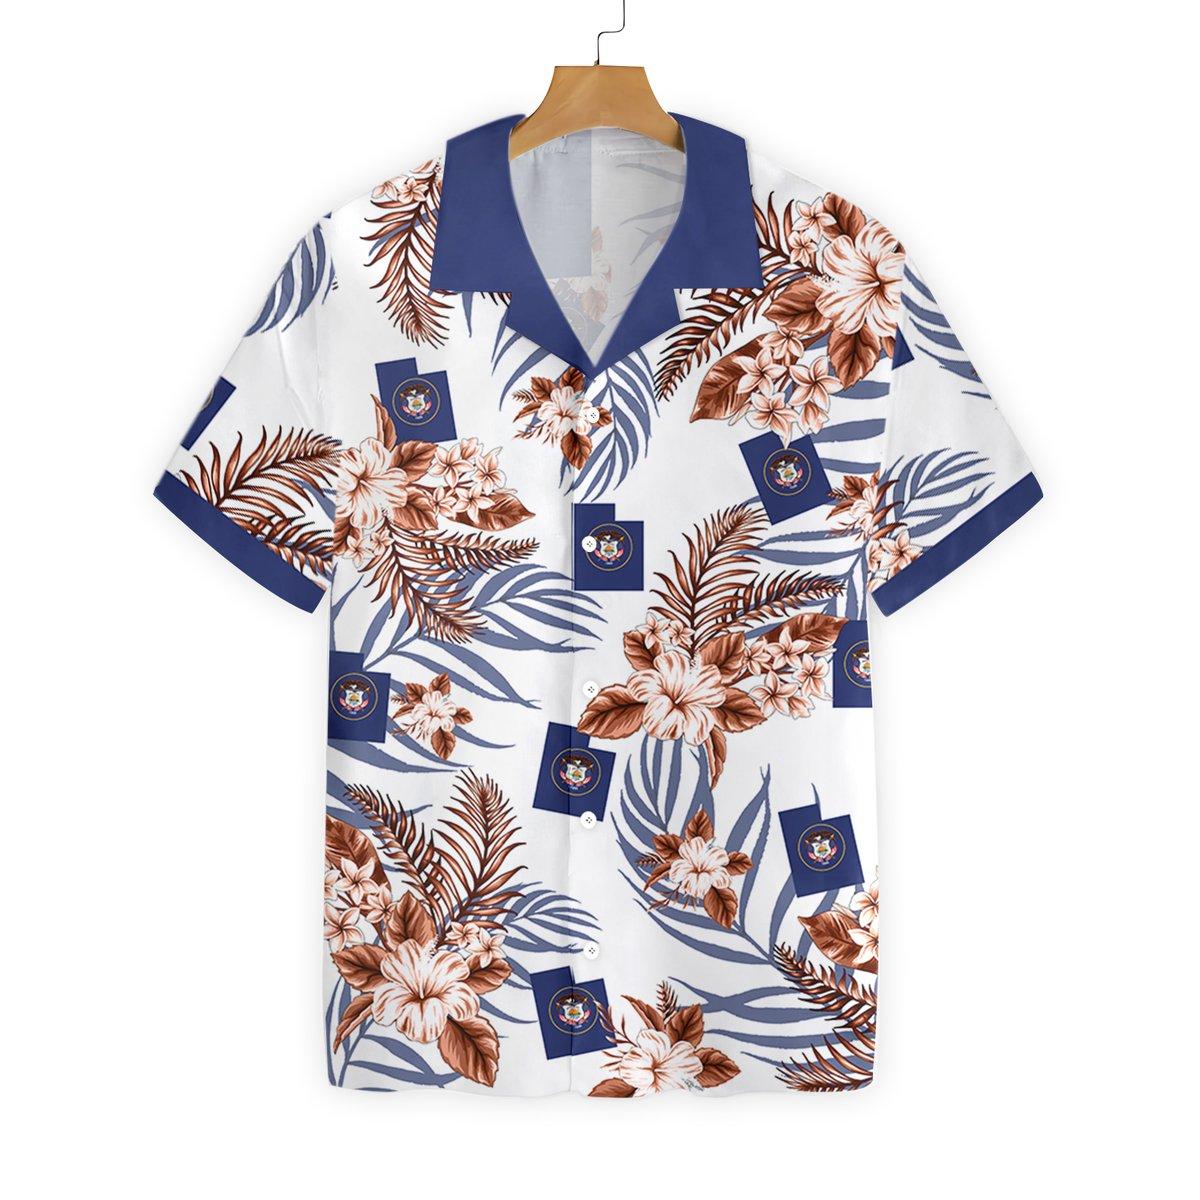 TOP HAWAIIAN SHIRT FOR MEN IN JULY 18